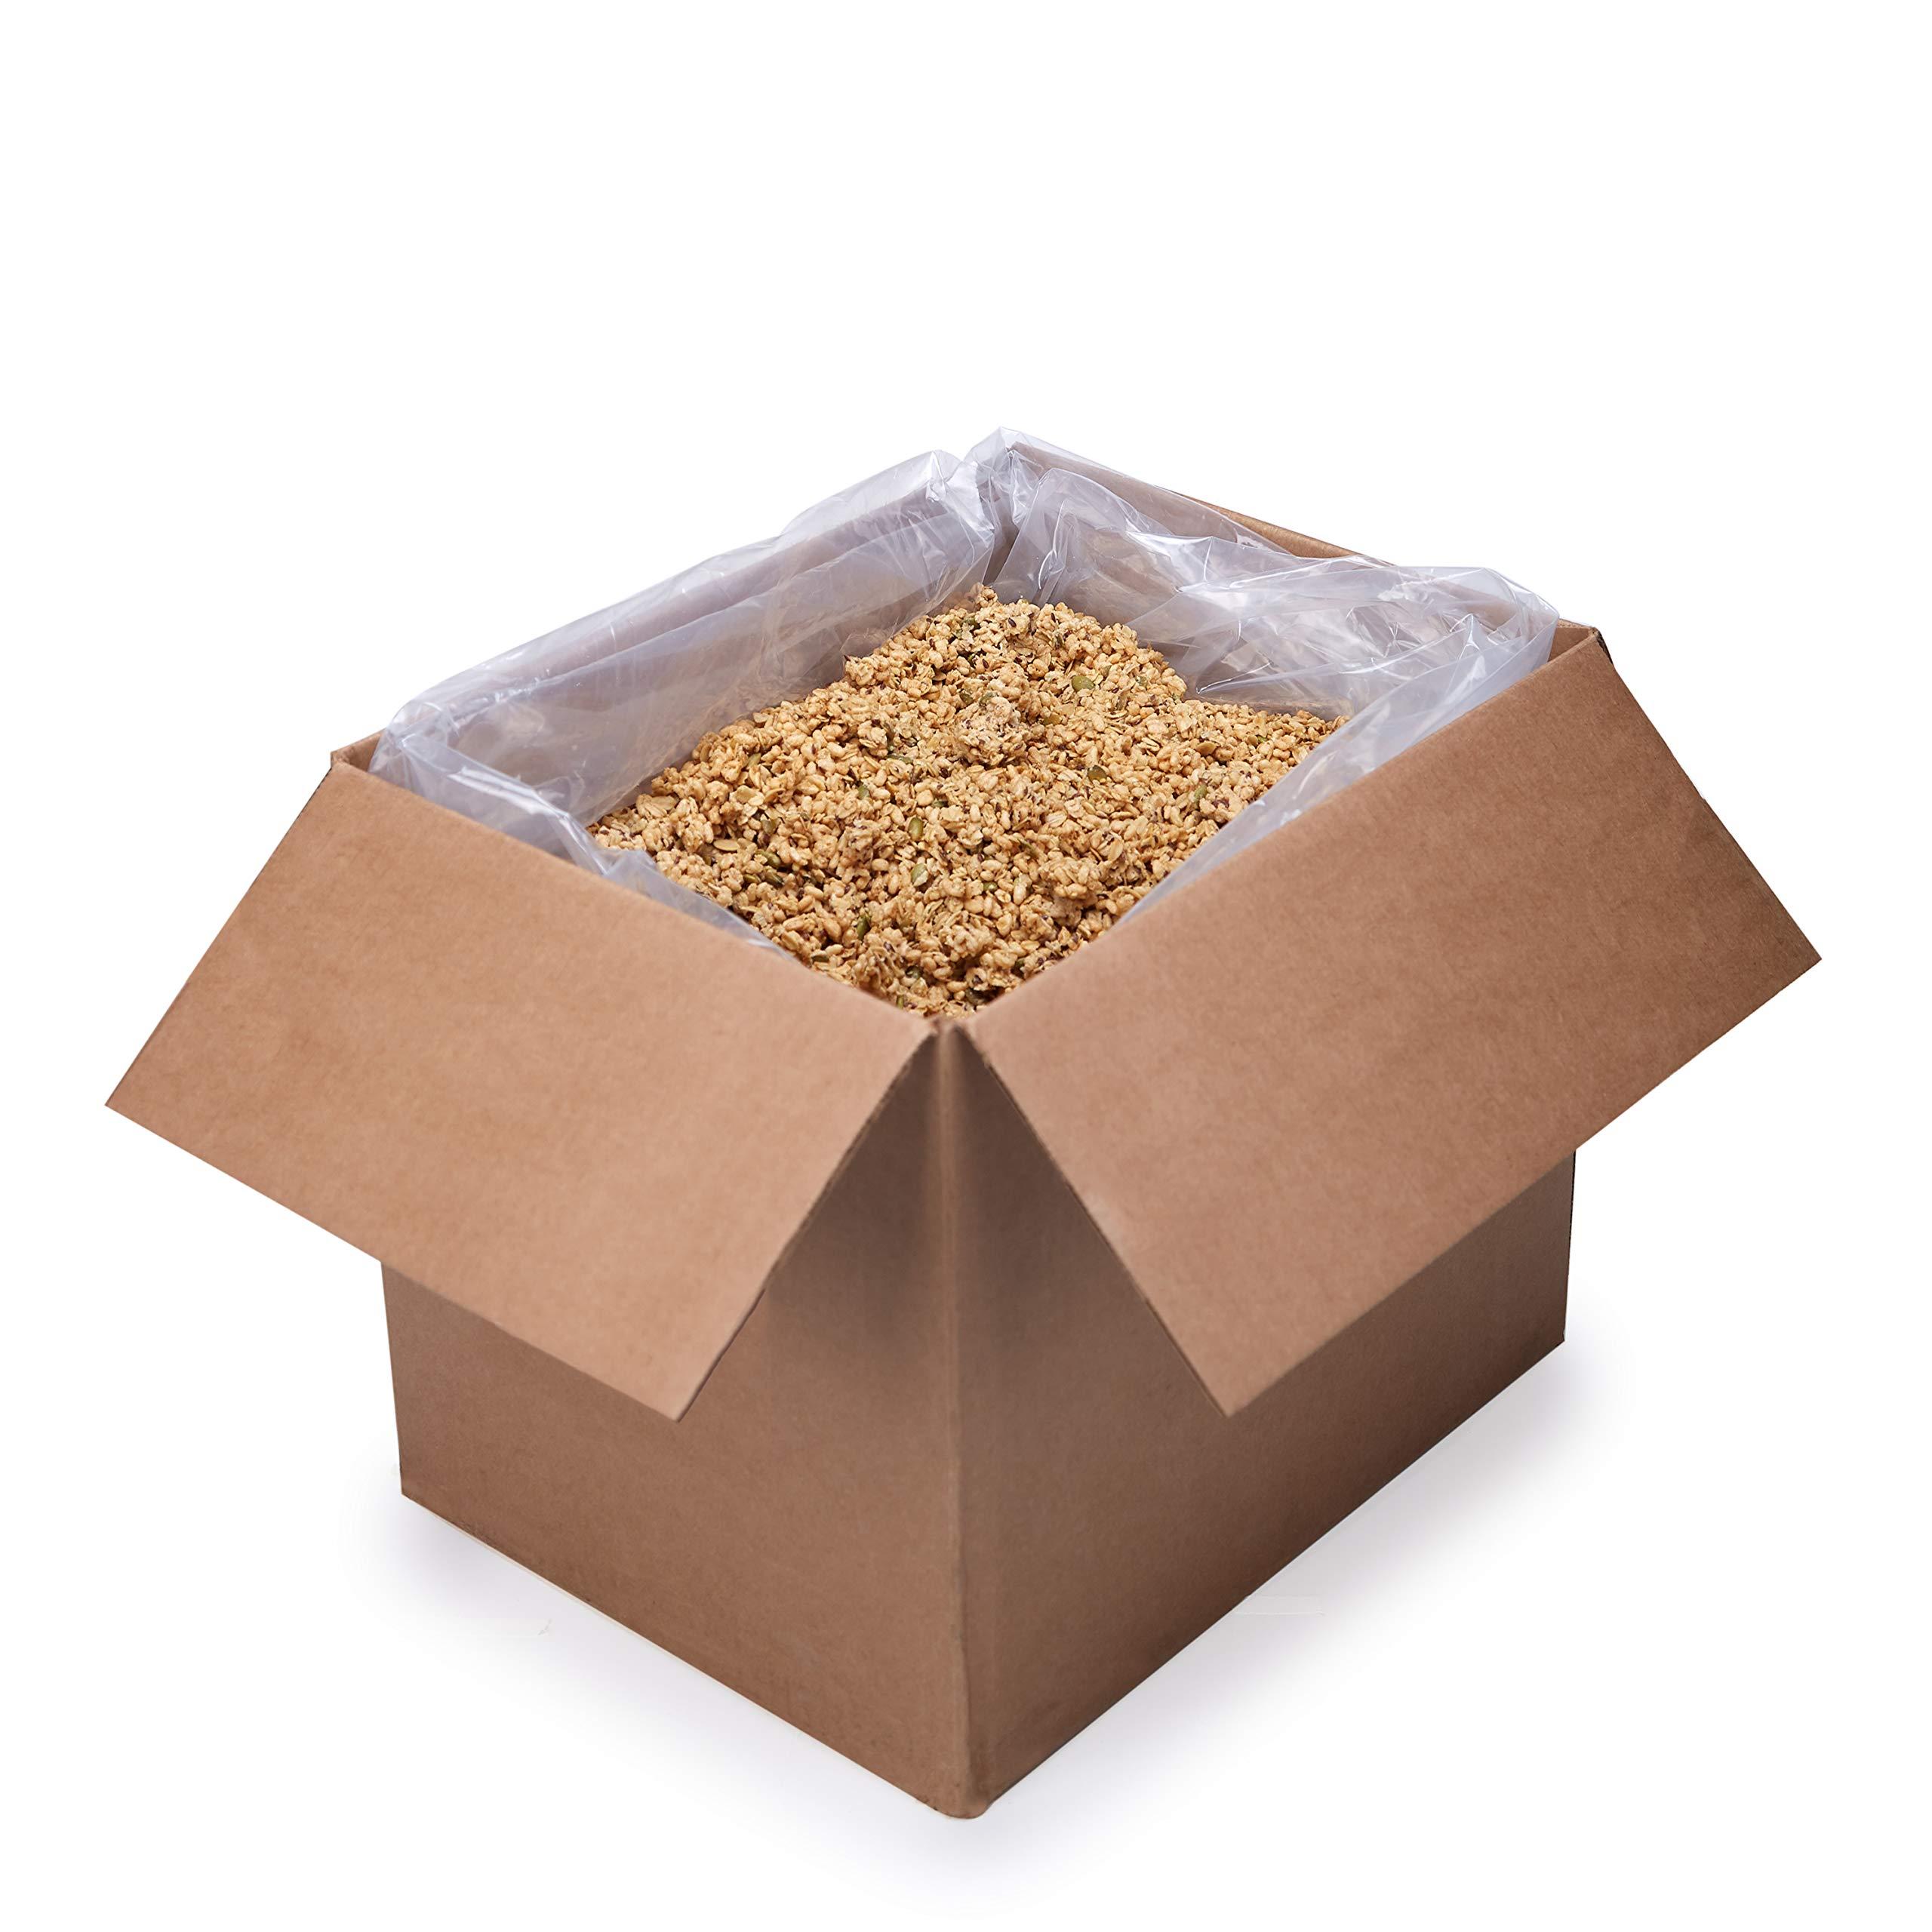 Nature's Path Pumpkin Seed Plus Flax Granola, Healthy, Organic, 25 lb. Bulk Box by Nature's Path